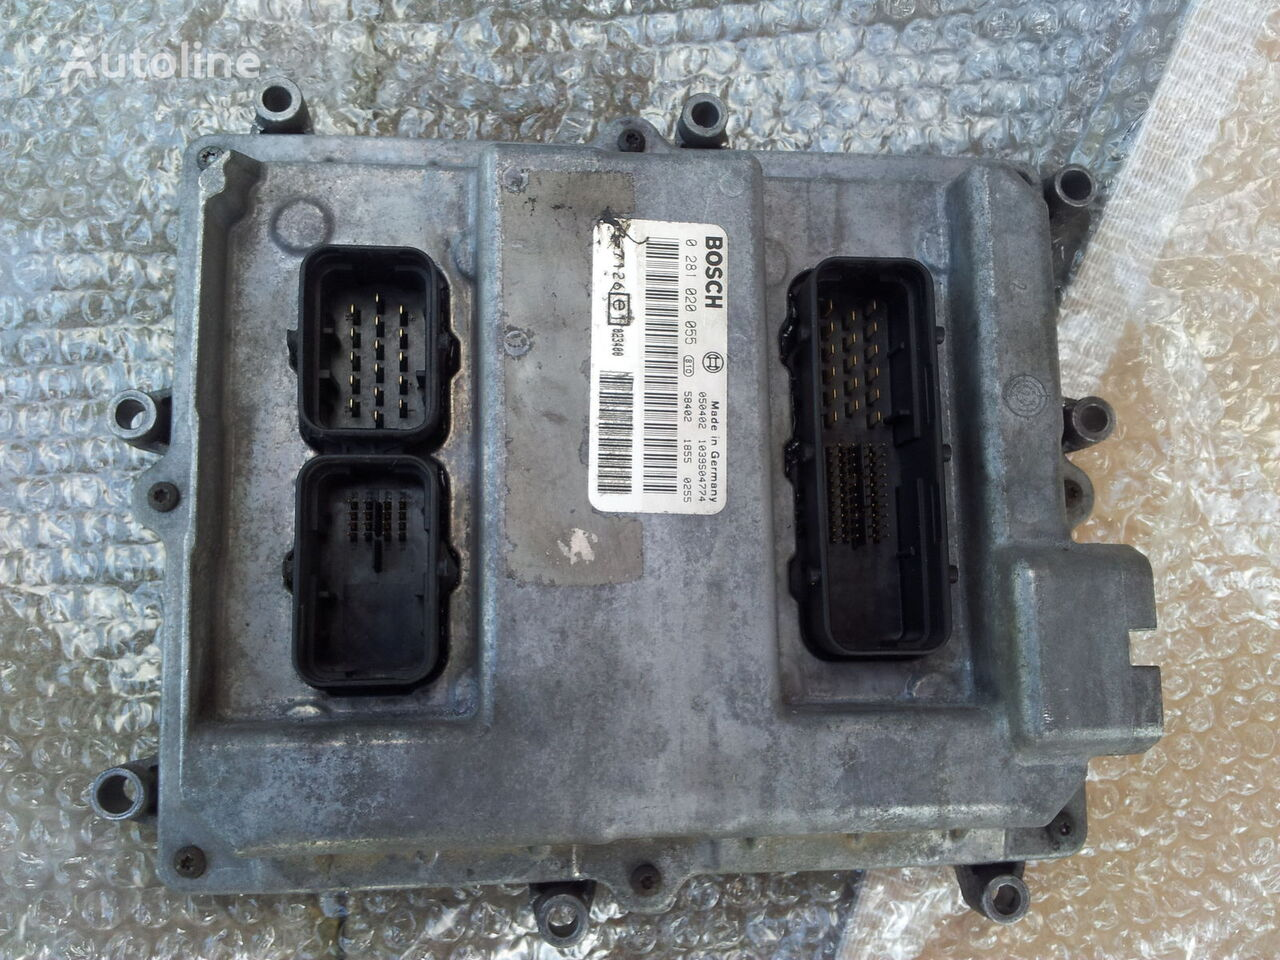 MAN Common Rail EDC, ECU electronic diesel control 0281020055, D2066LF01, 51258037126, 51258337169, 51258037127, 51258337168 unidad de control para MAN TGA tractora